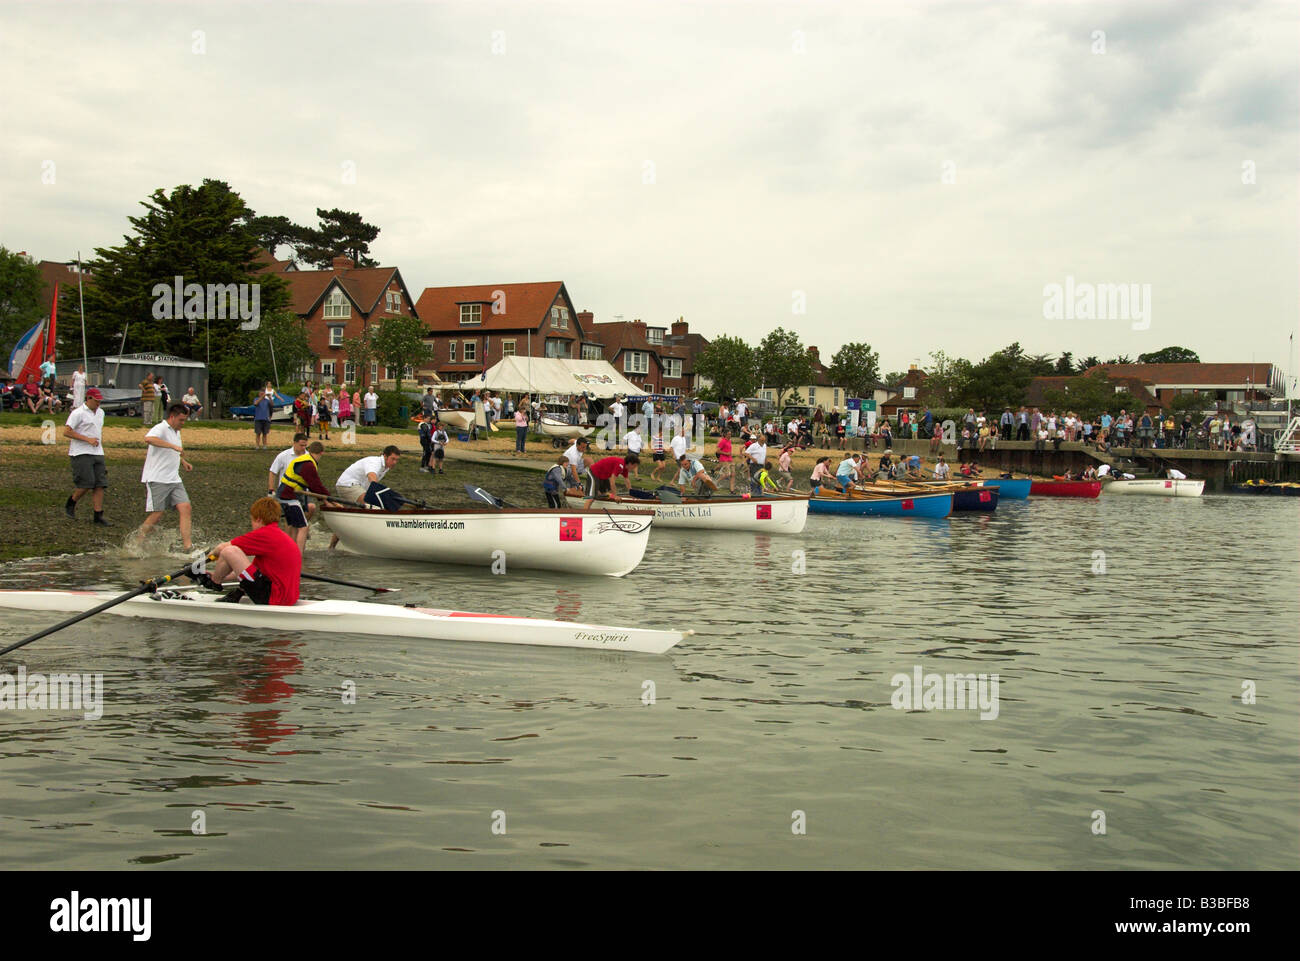 Hamble River Raid Charity Rowing Race on the Hamble River Stock Photo